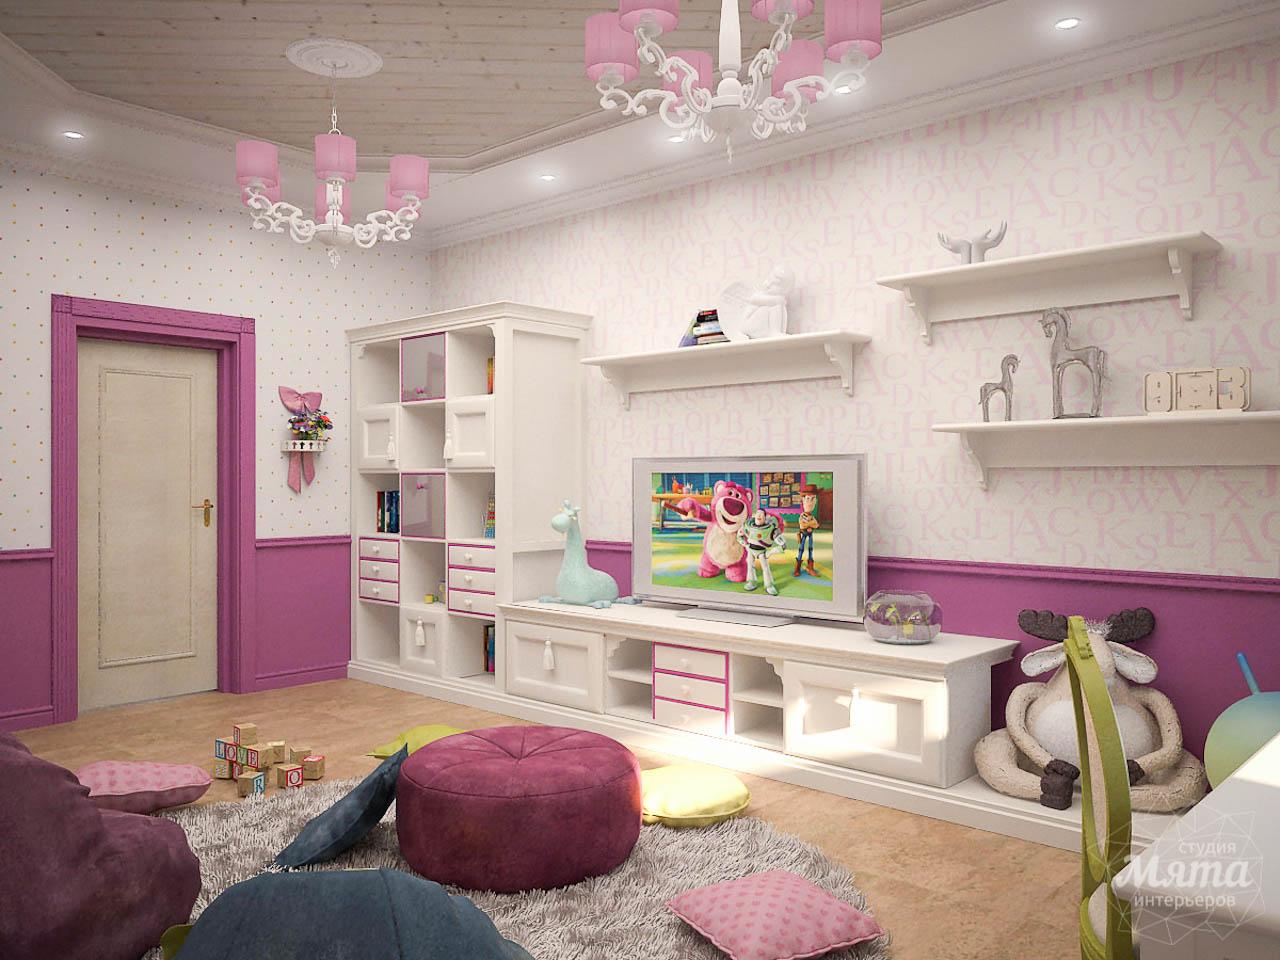 Дизайн интерьера коттеджа по ул. Ландышевая 23 img1508114676